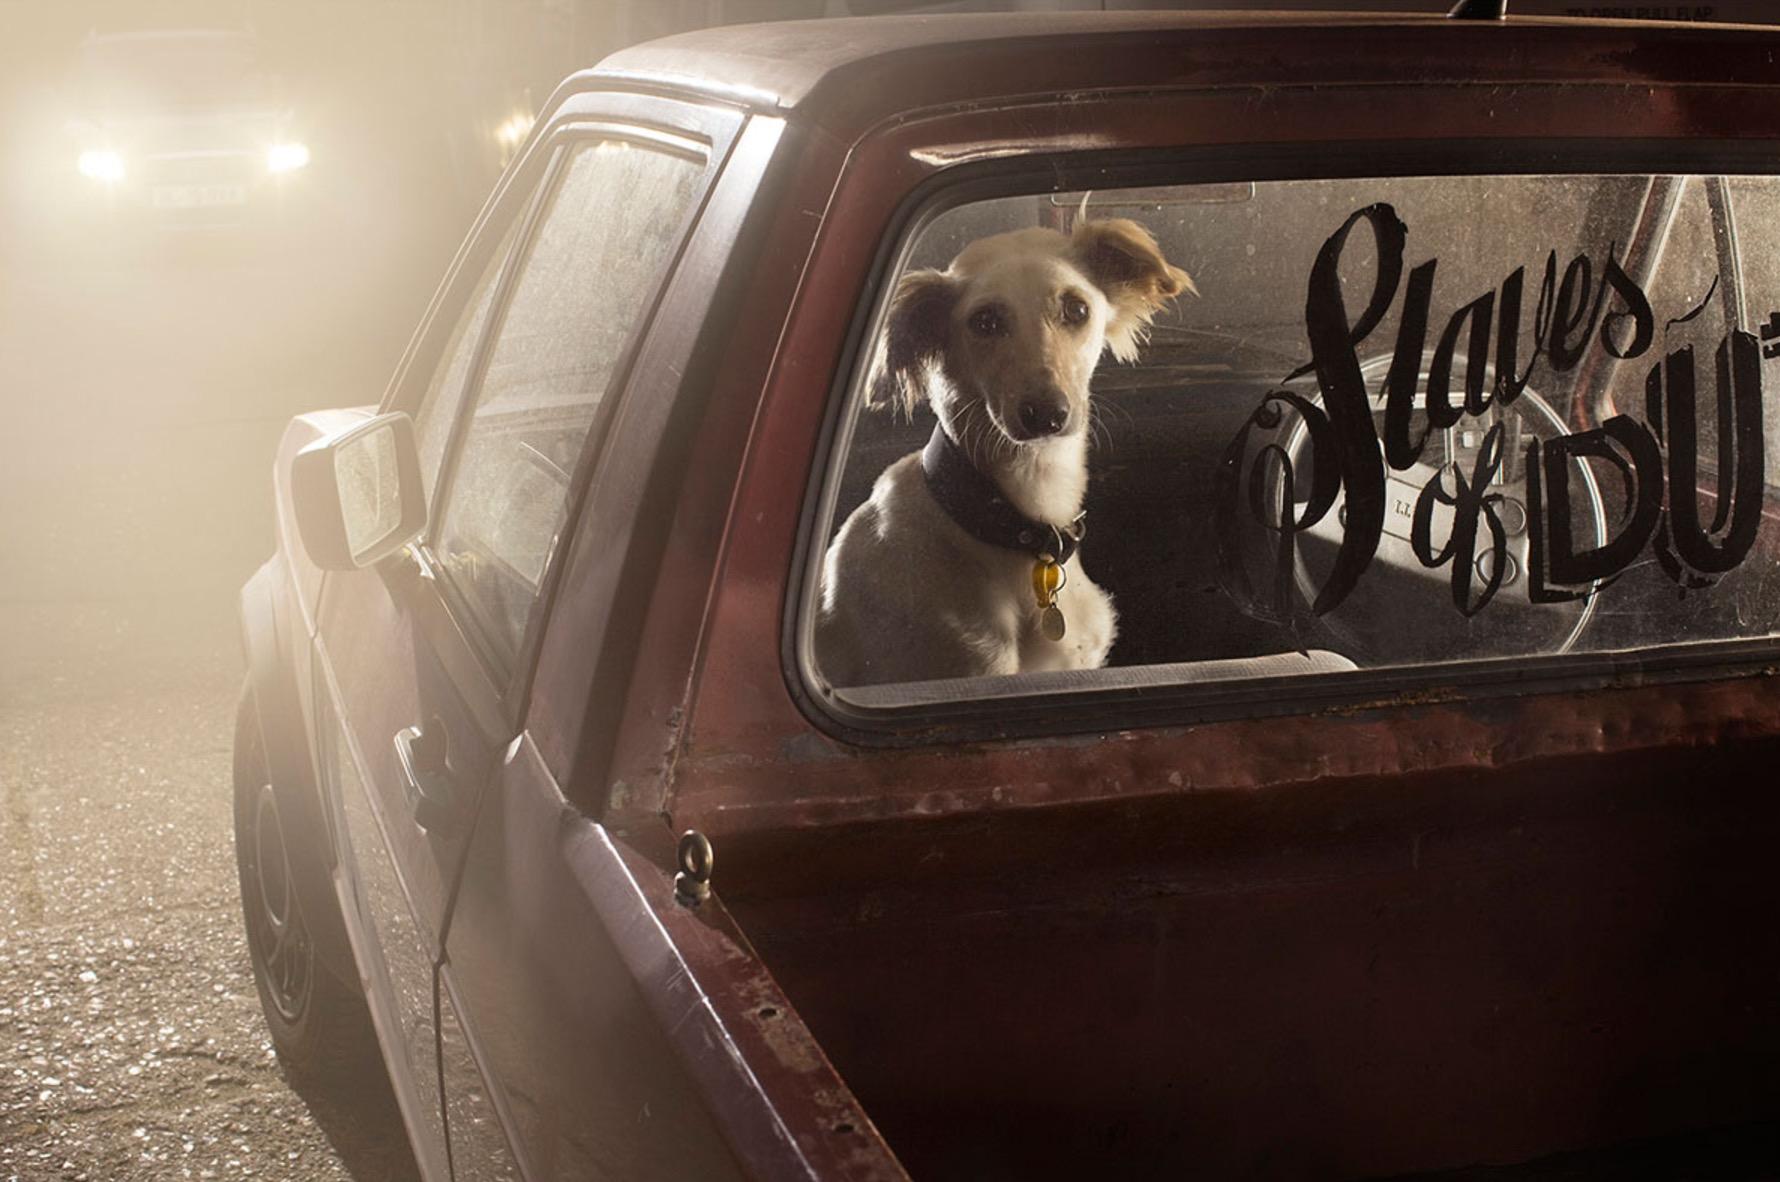 Martin-Usborne-photographe-chiens-voitures-3